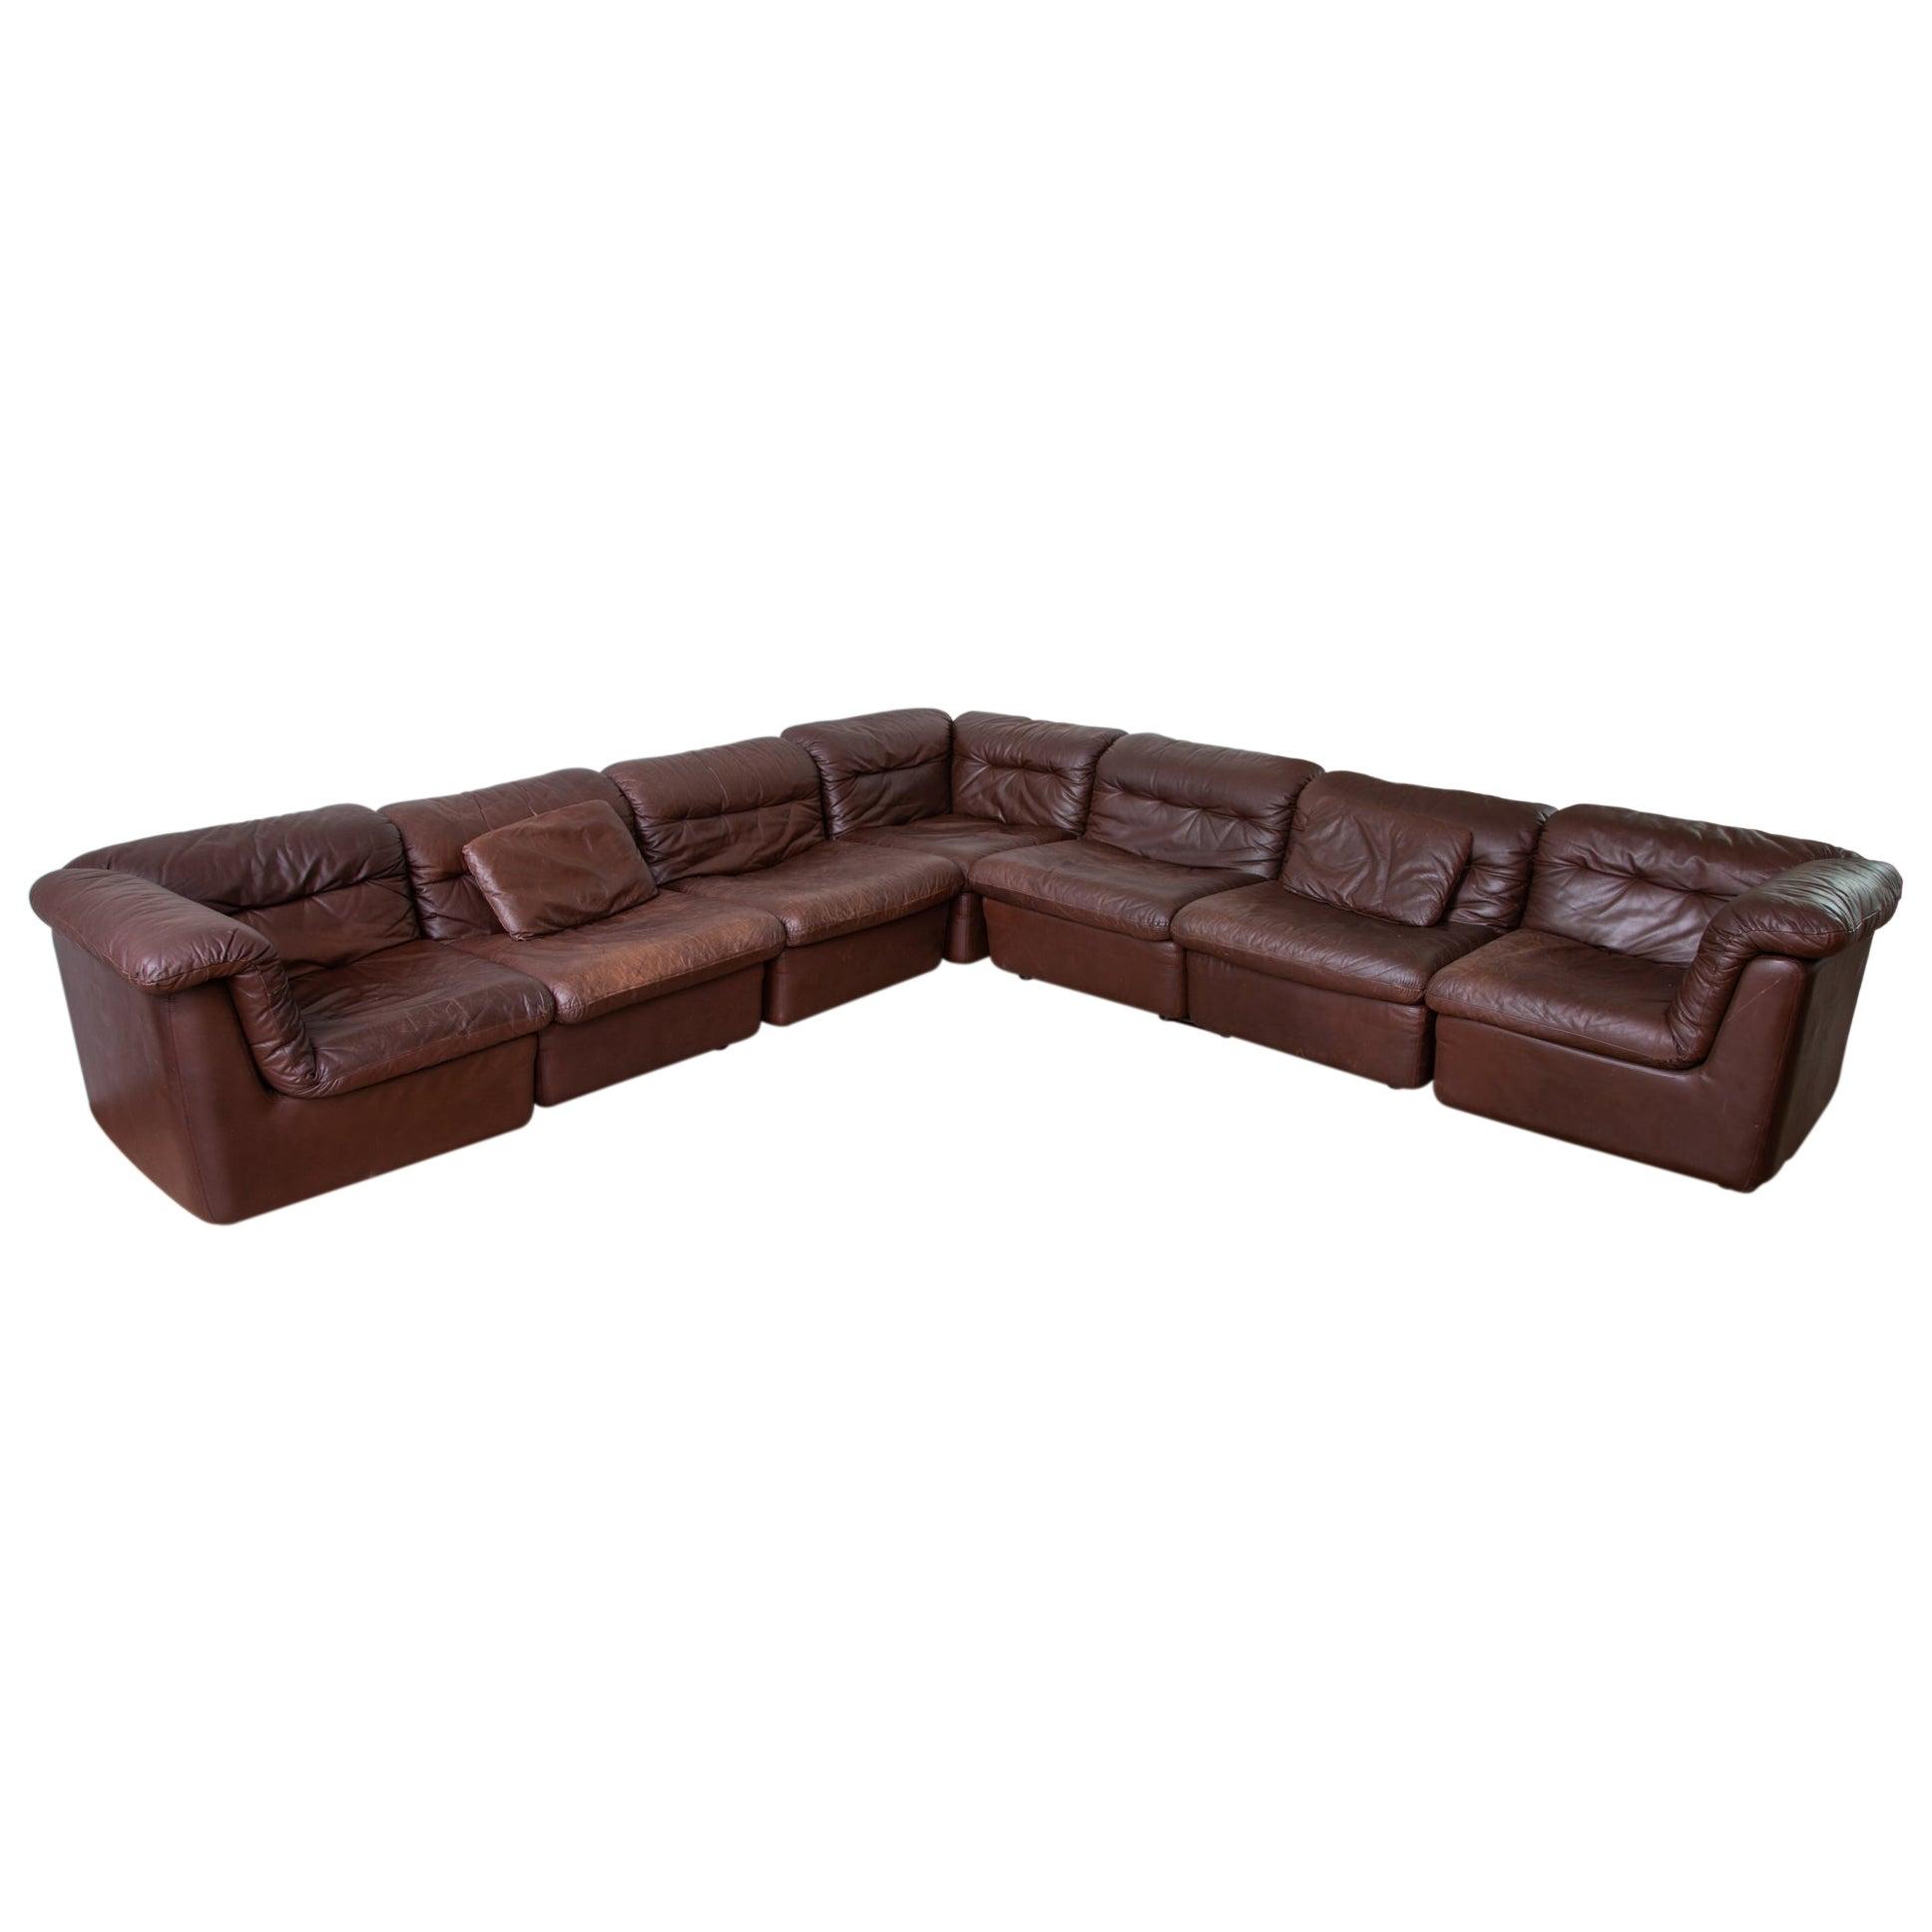 WK Möbel Modular Brown Leather Sofa by Ernst Martin Dettinger